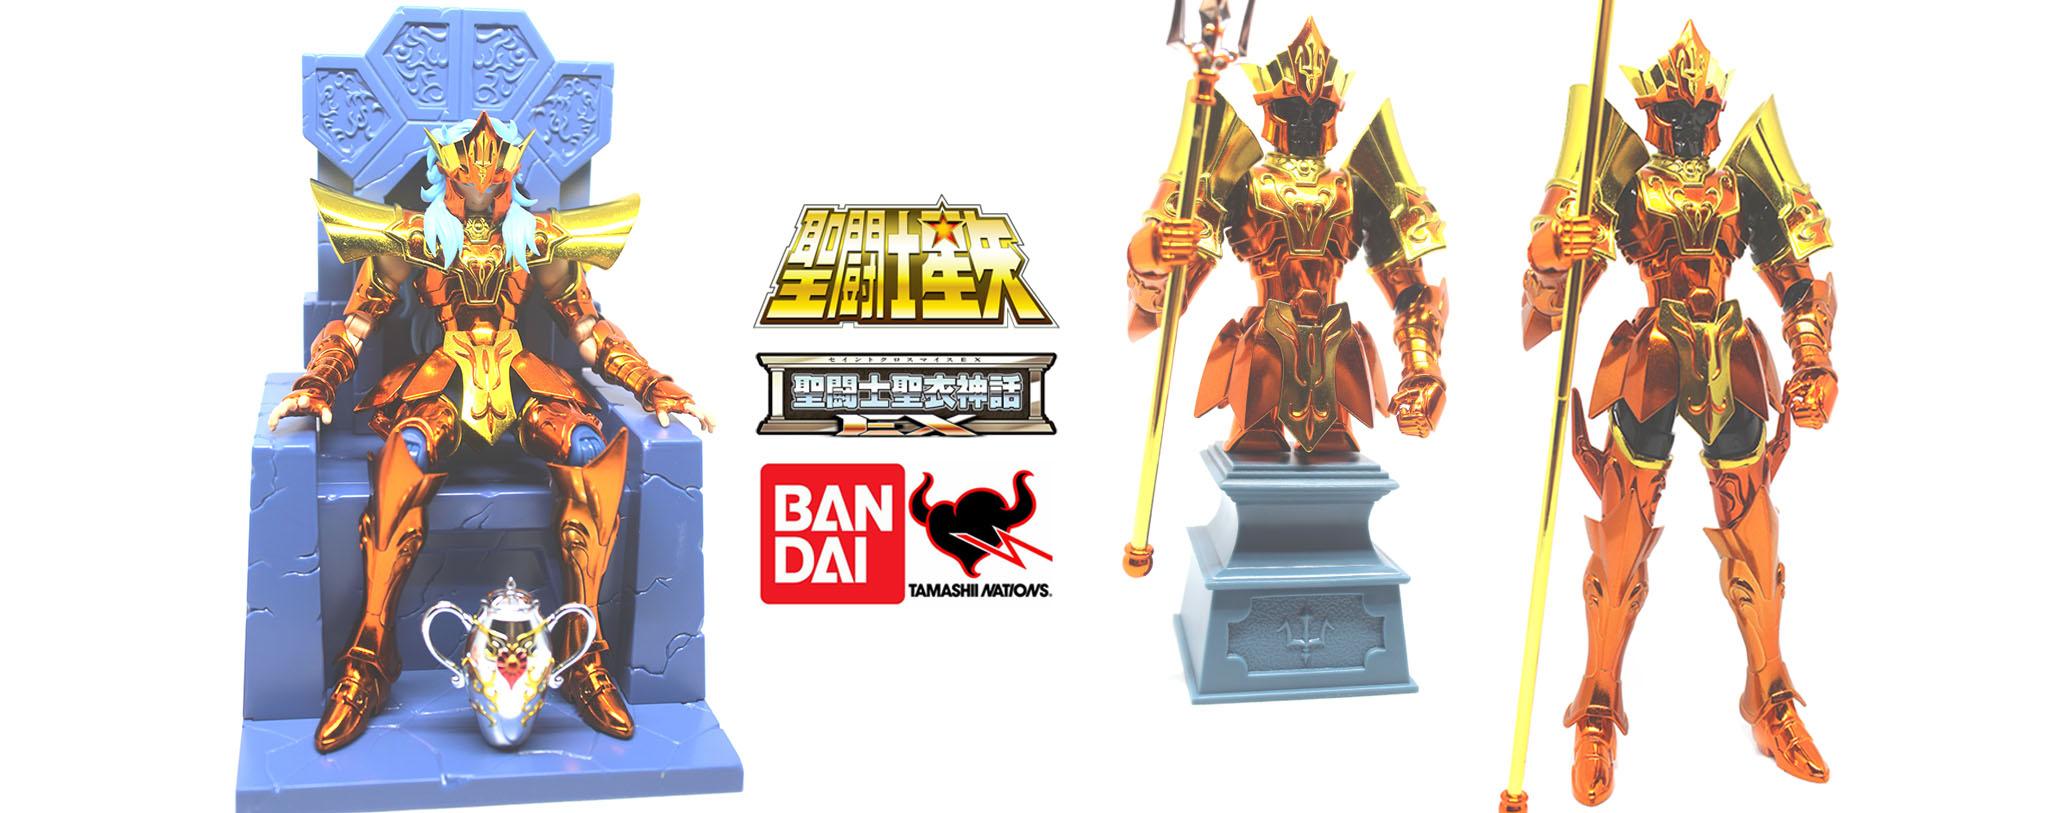 Recensione: Sea Emperor Poseidon (Imperial Throne Set) di Tamashii Nations